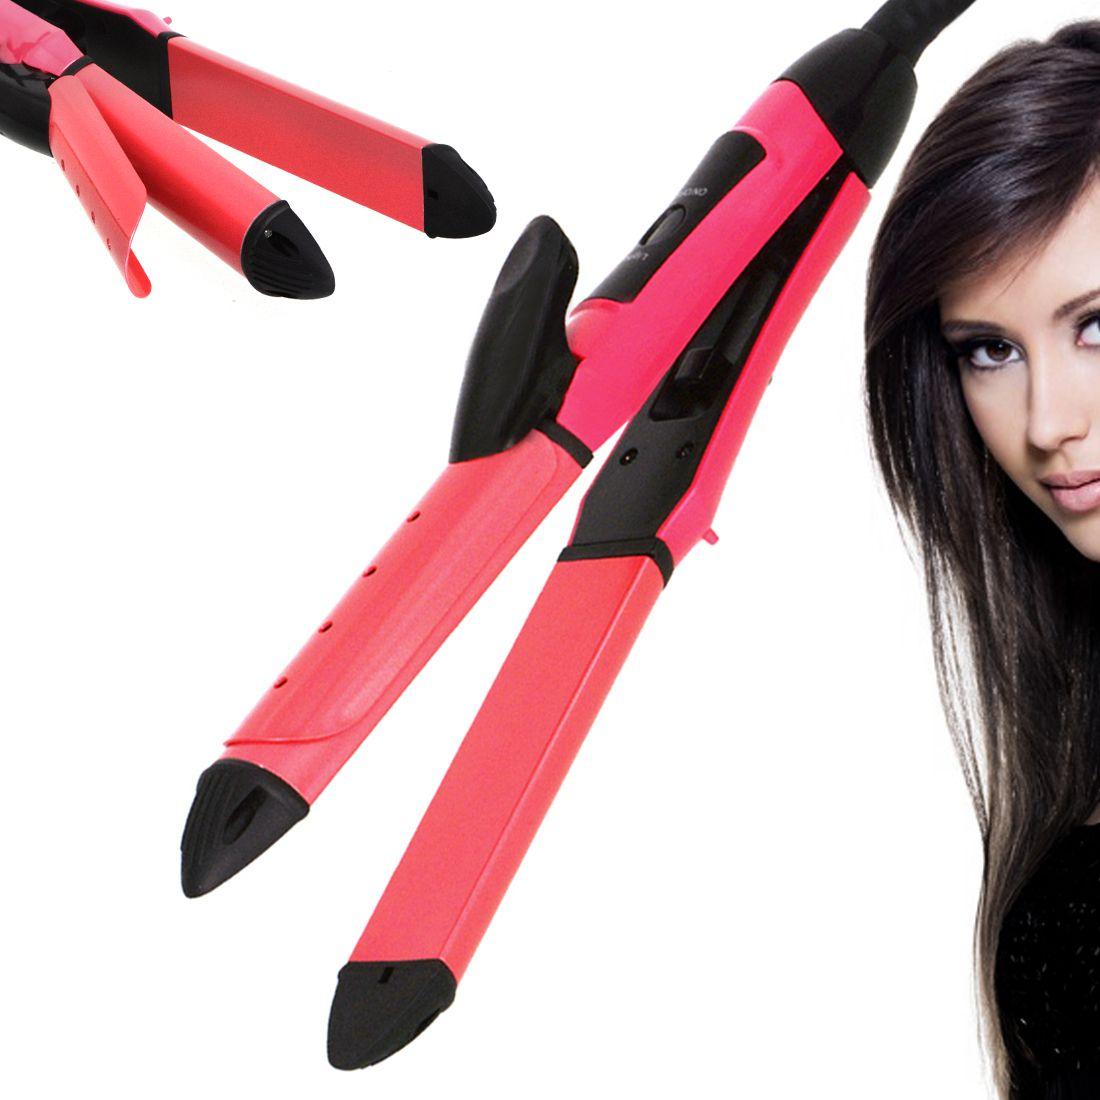 SJ 2 in 1 Professional Travel Hair Straighteners Flat Iron 45W Hair Straightener ( Red )